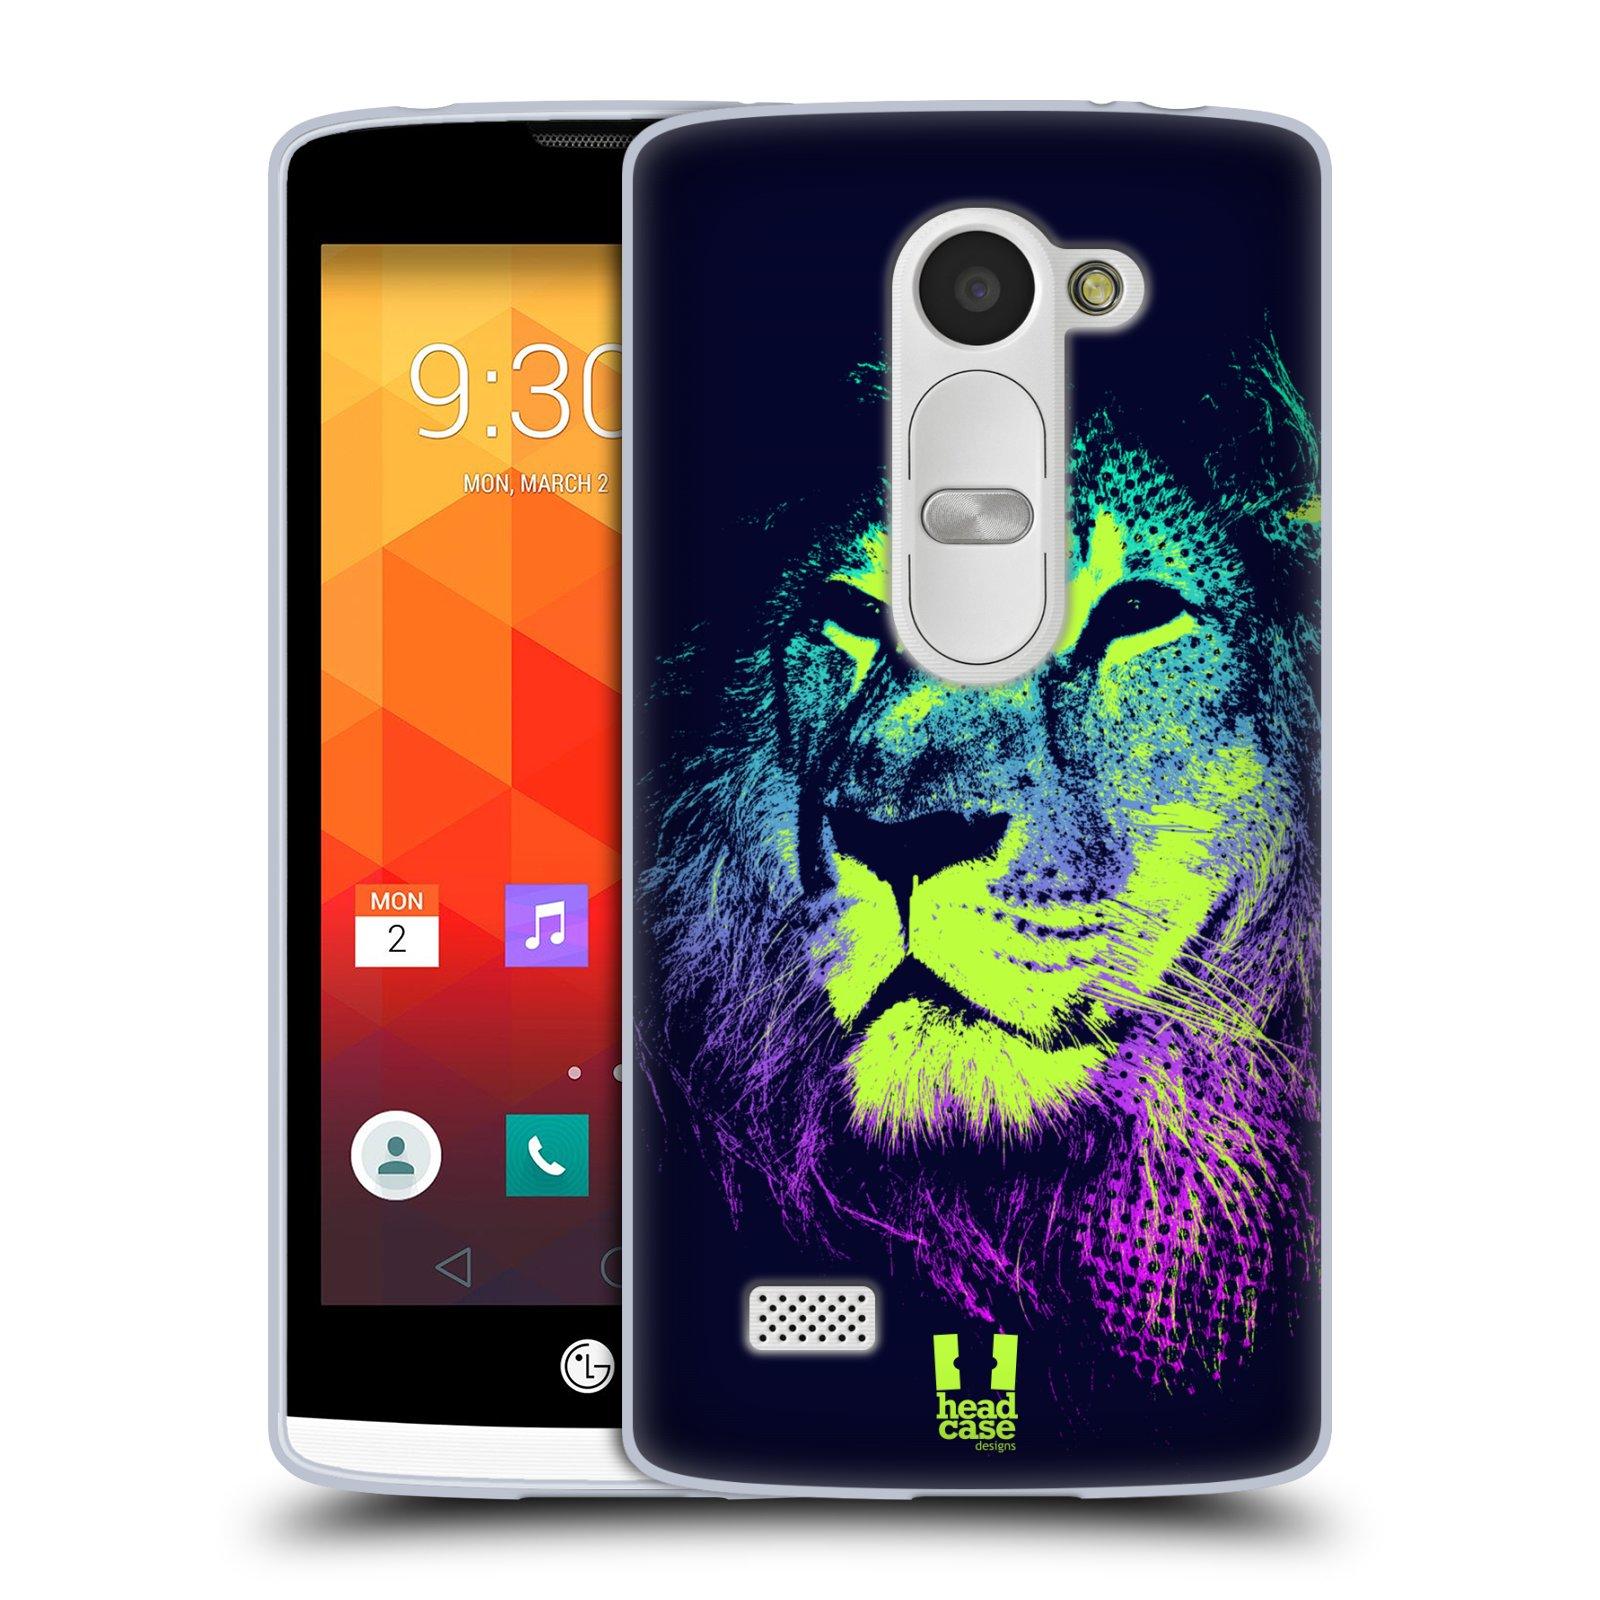 Silikonové pouzdro na mobil LG Leon LTE HEAD CASE POP PRINT LEV (Silikonový kryt či obal na mobilní telefon LG Leon H320 a LG Leon LTE H340N)